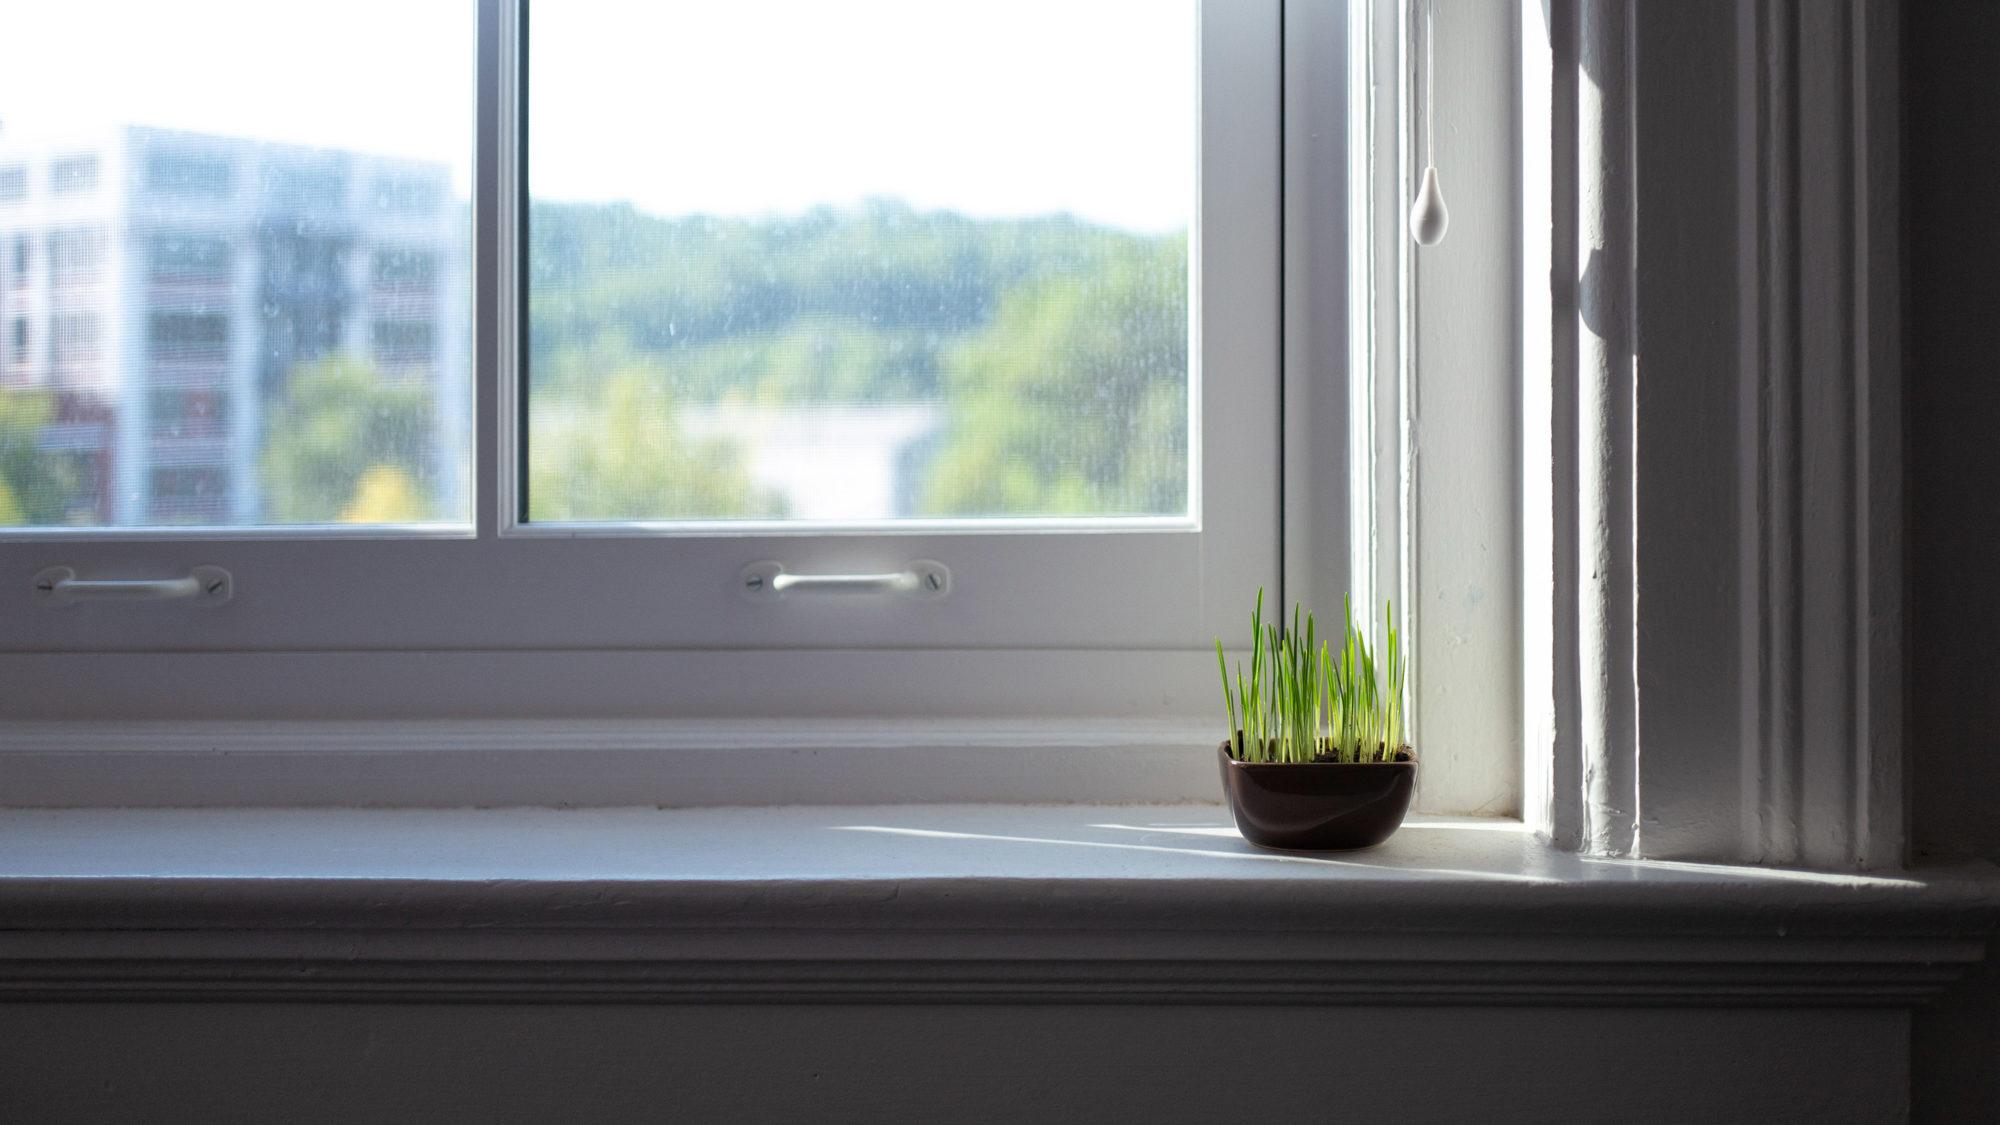 cat grass on window sill in sunlight